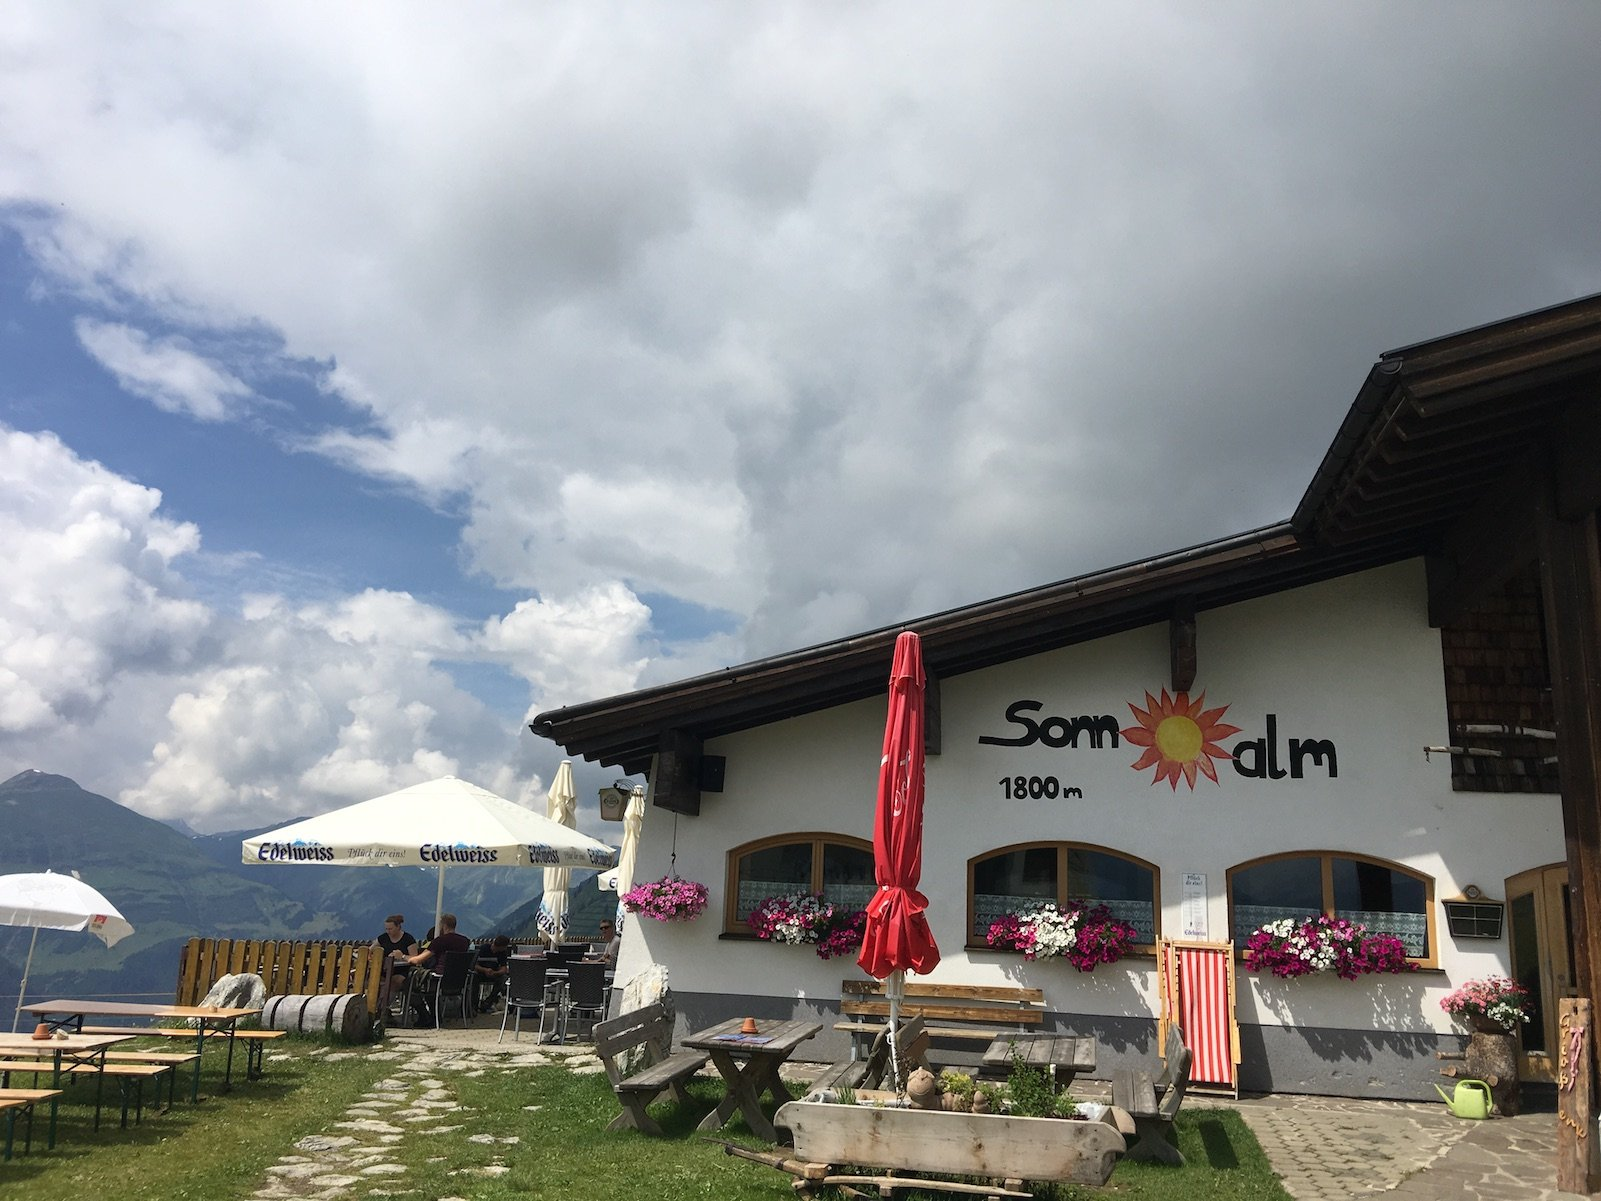 Berggasthof Sonnalm